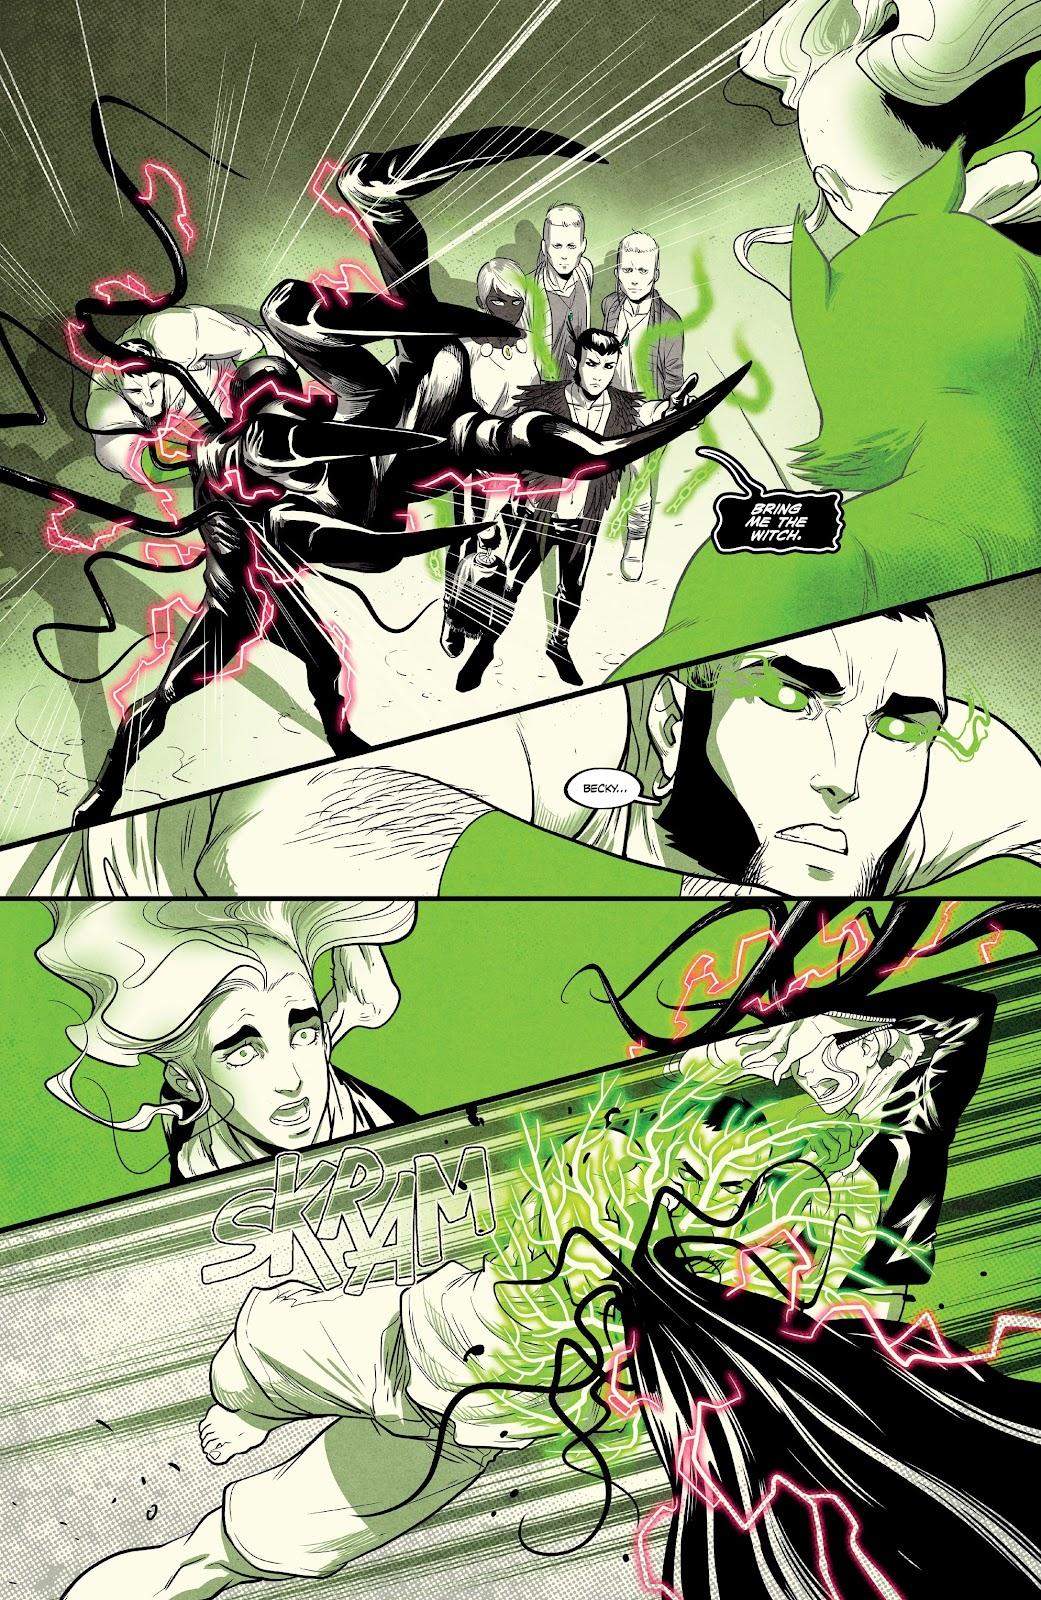 Read online Nomen Omen comic -  Issue #6 - 19